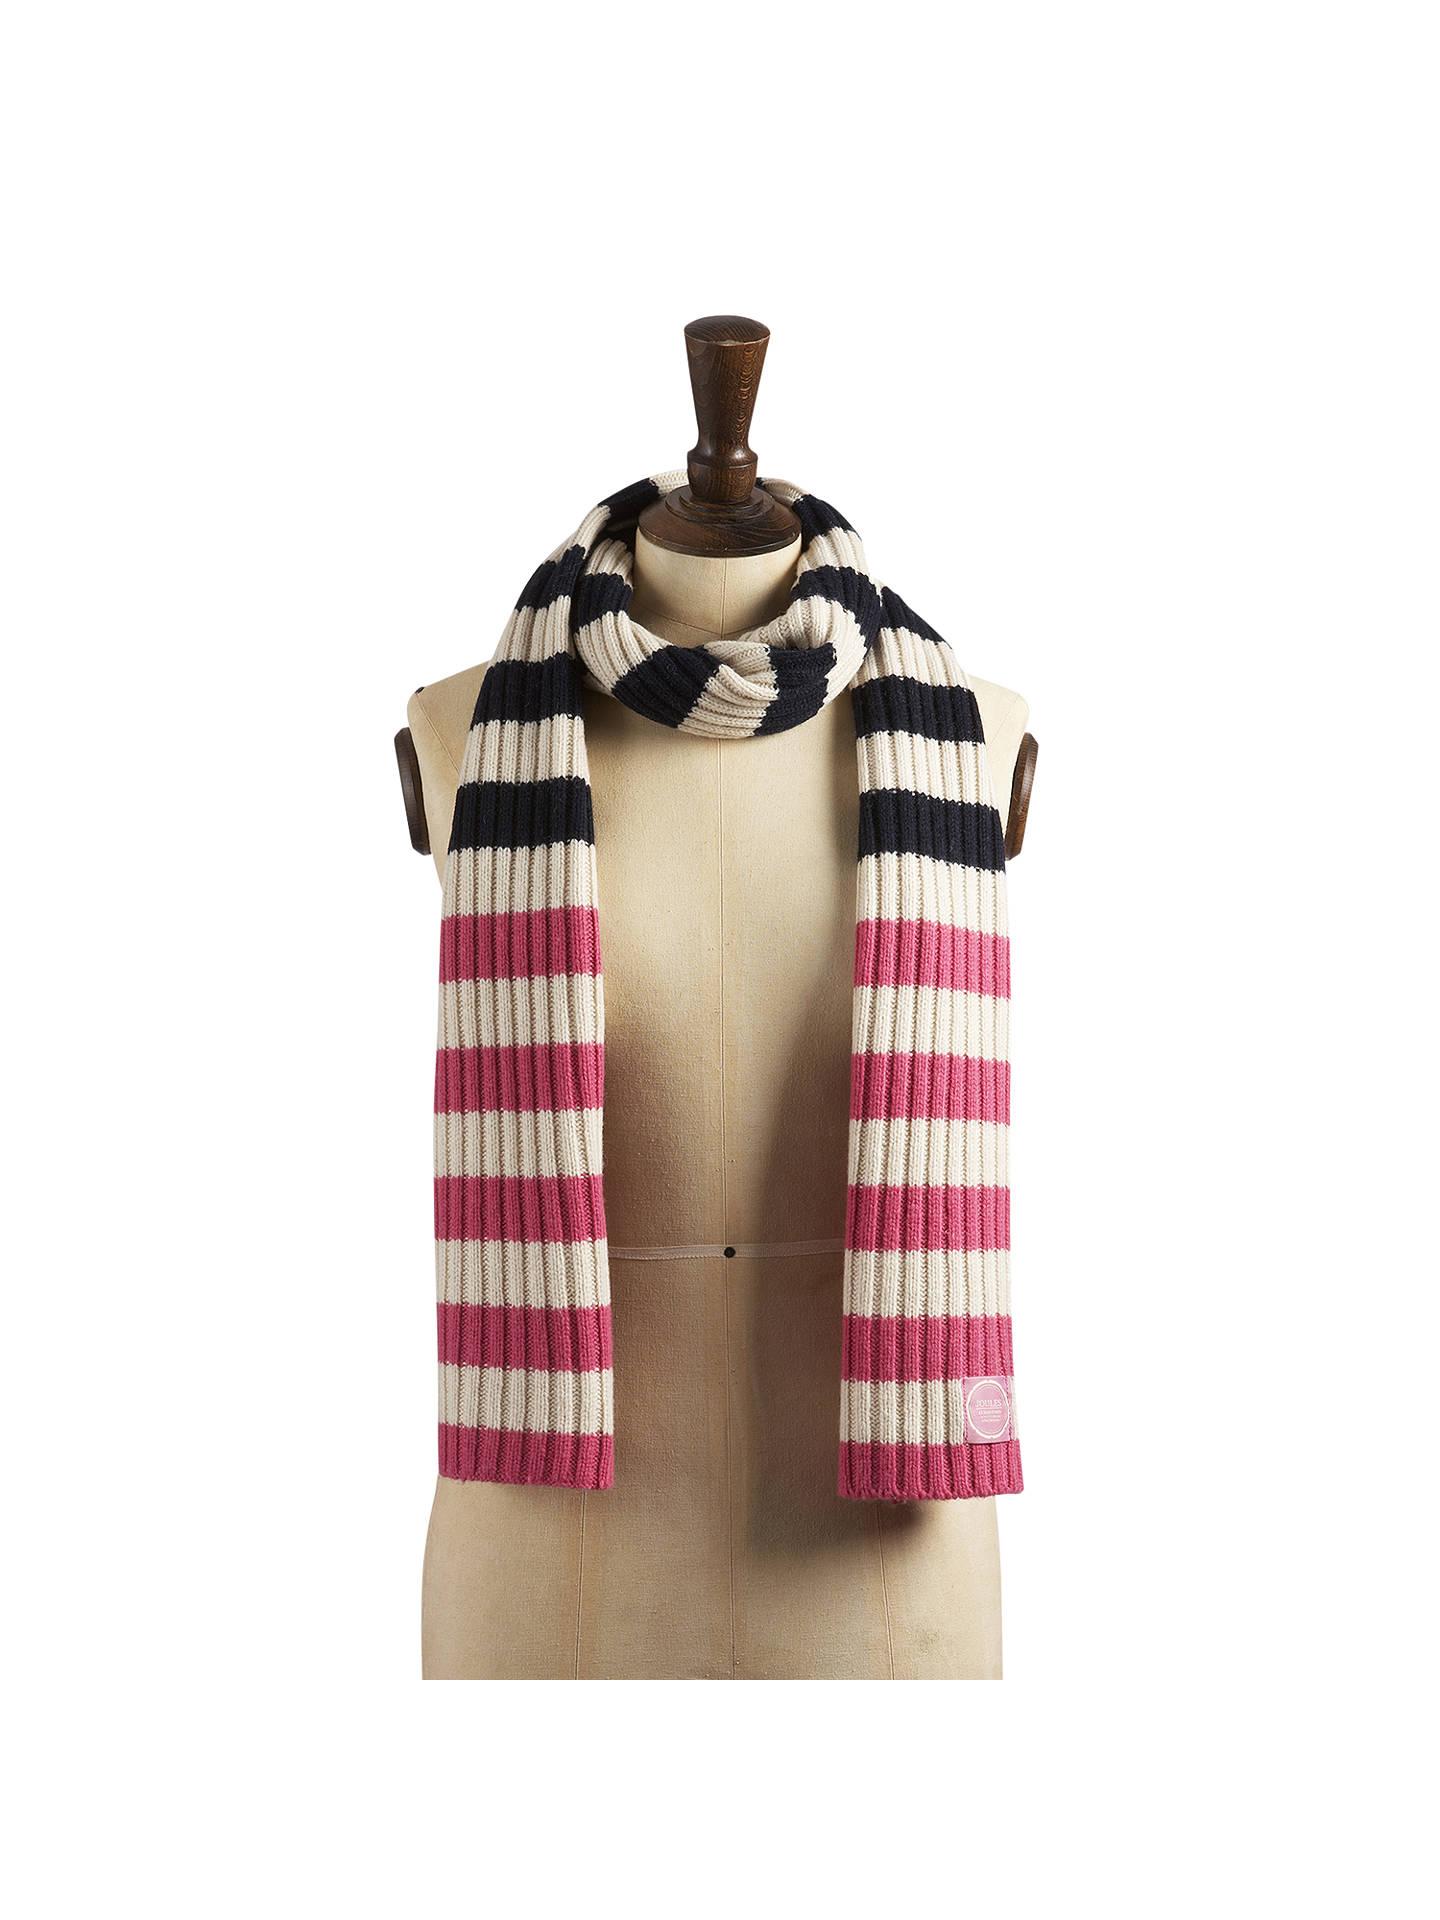 Royal Naval Association Heavy Knit Scarf